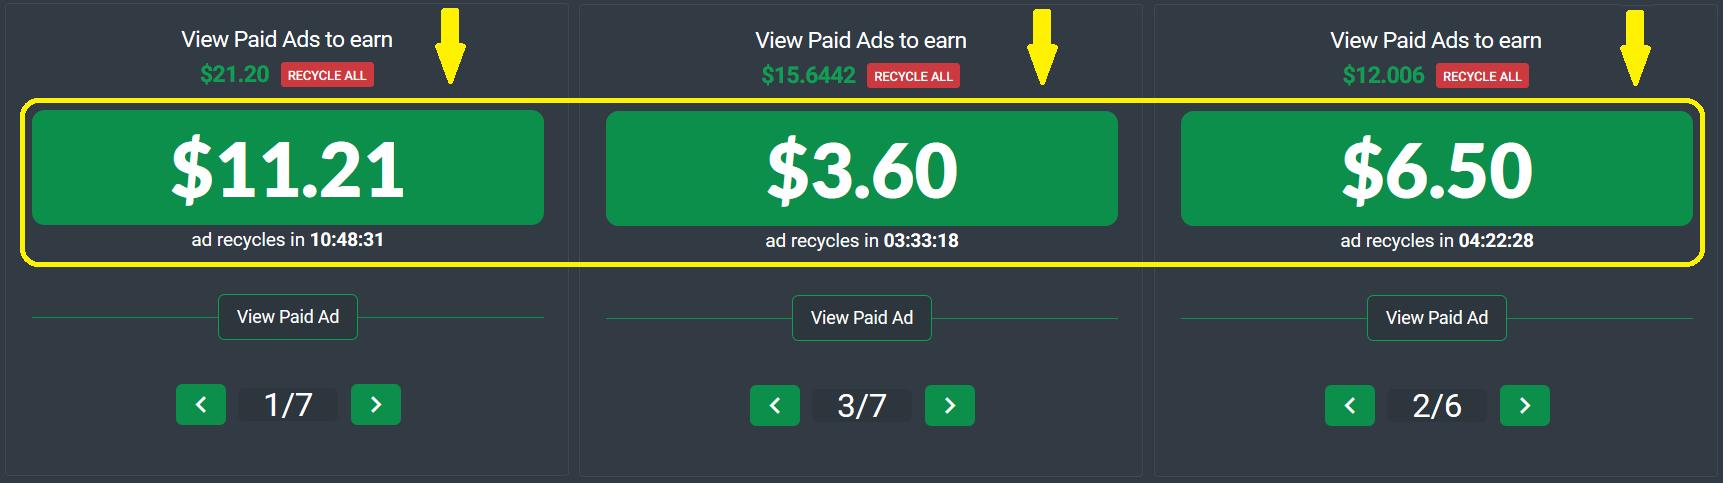 Big Paid Ads on PtcShare